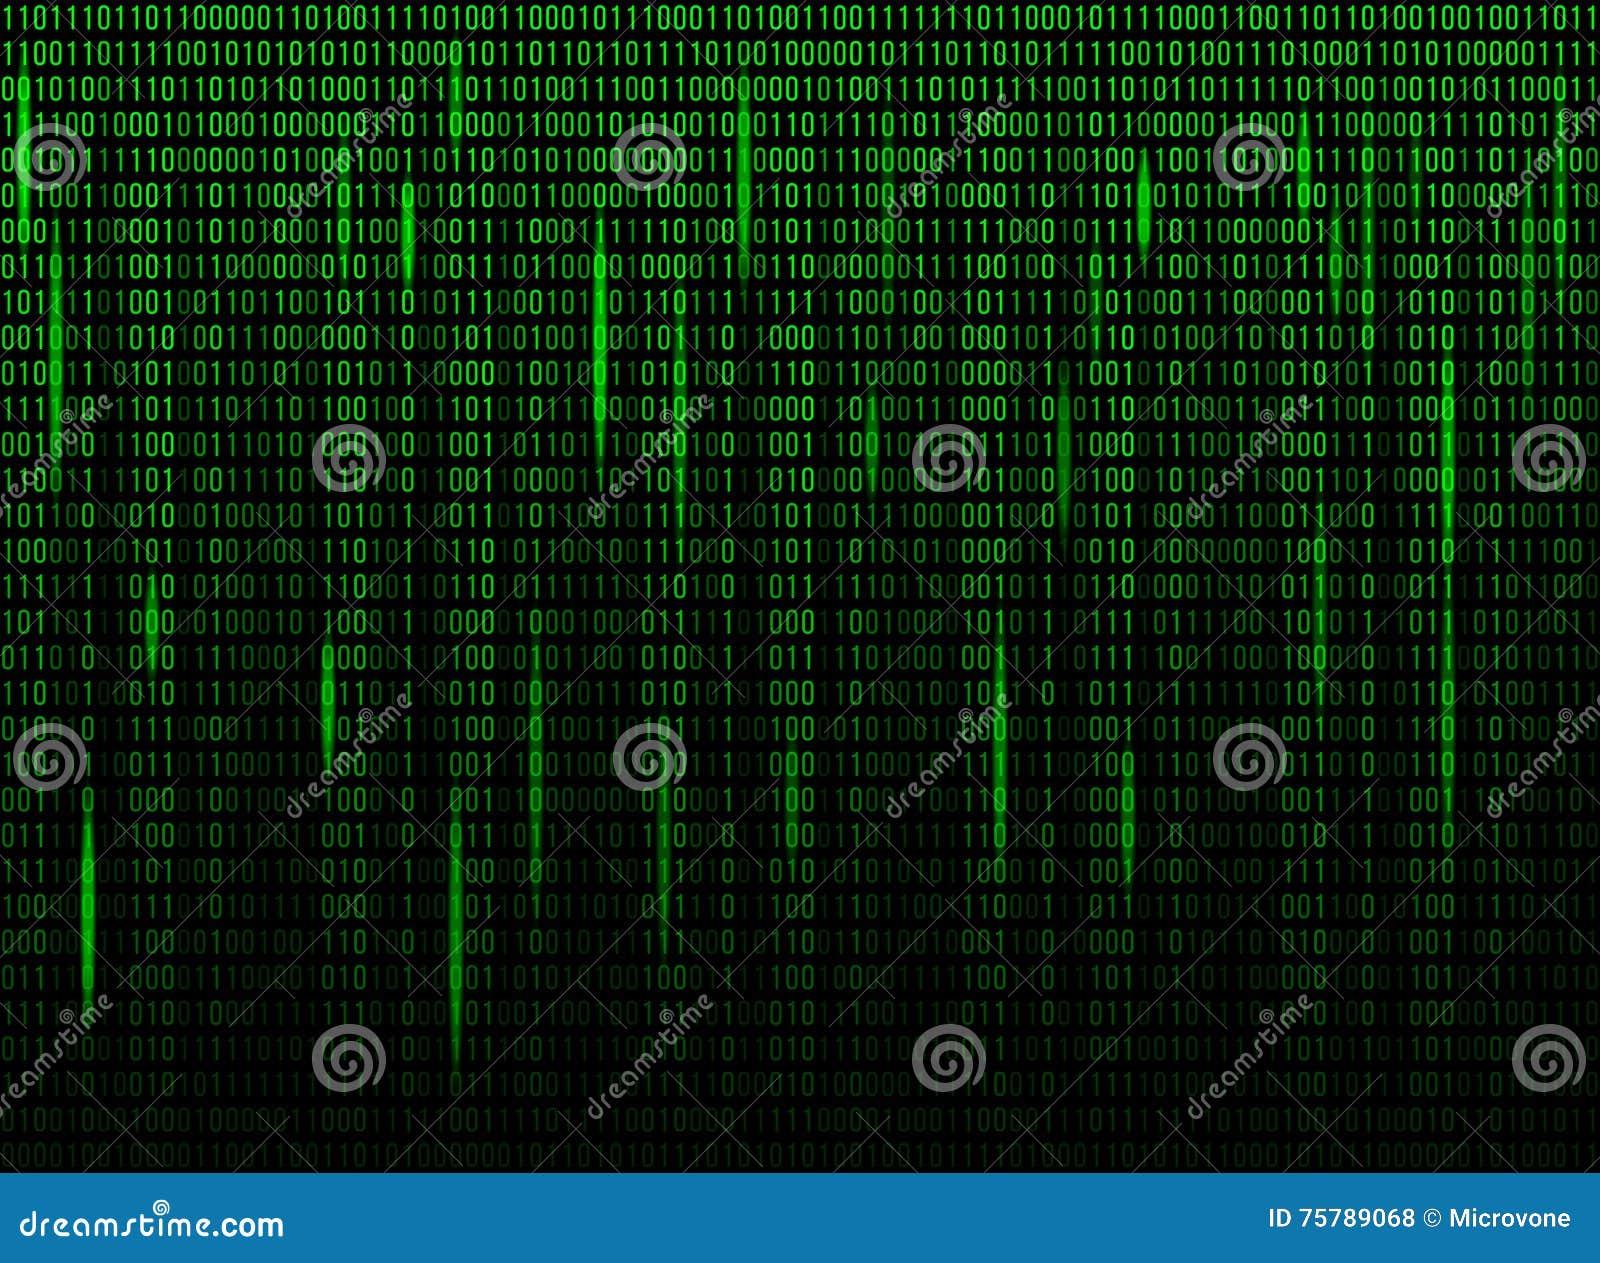 Computer Screen Binary Data Code Stock Vector - Illustration of ...